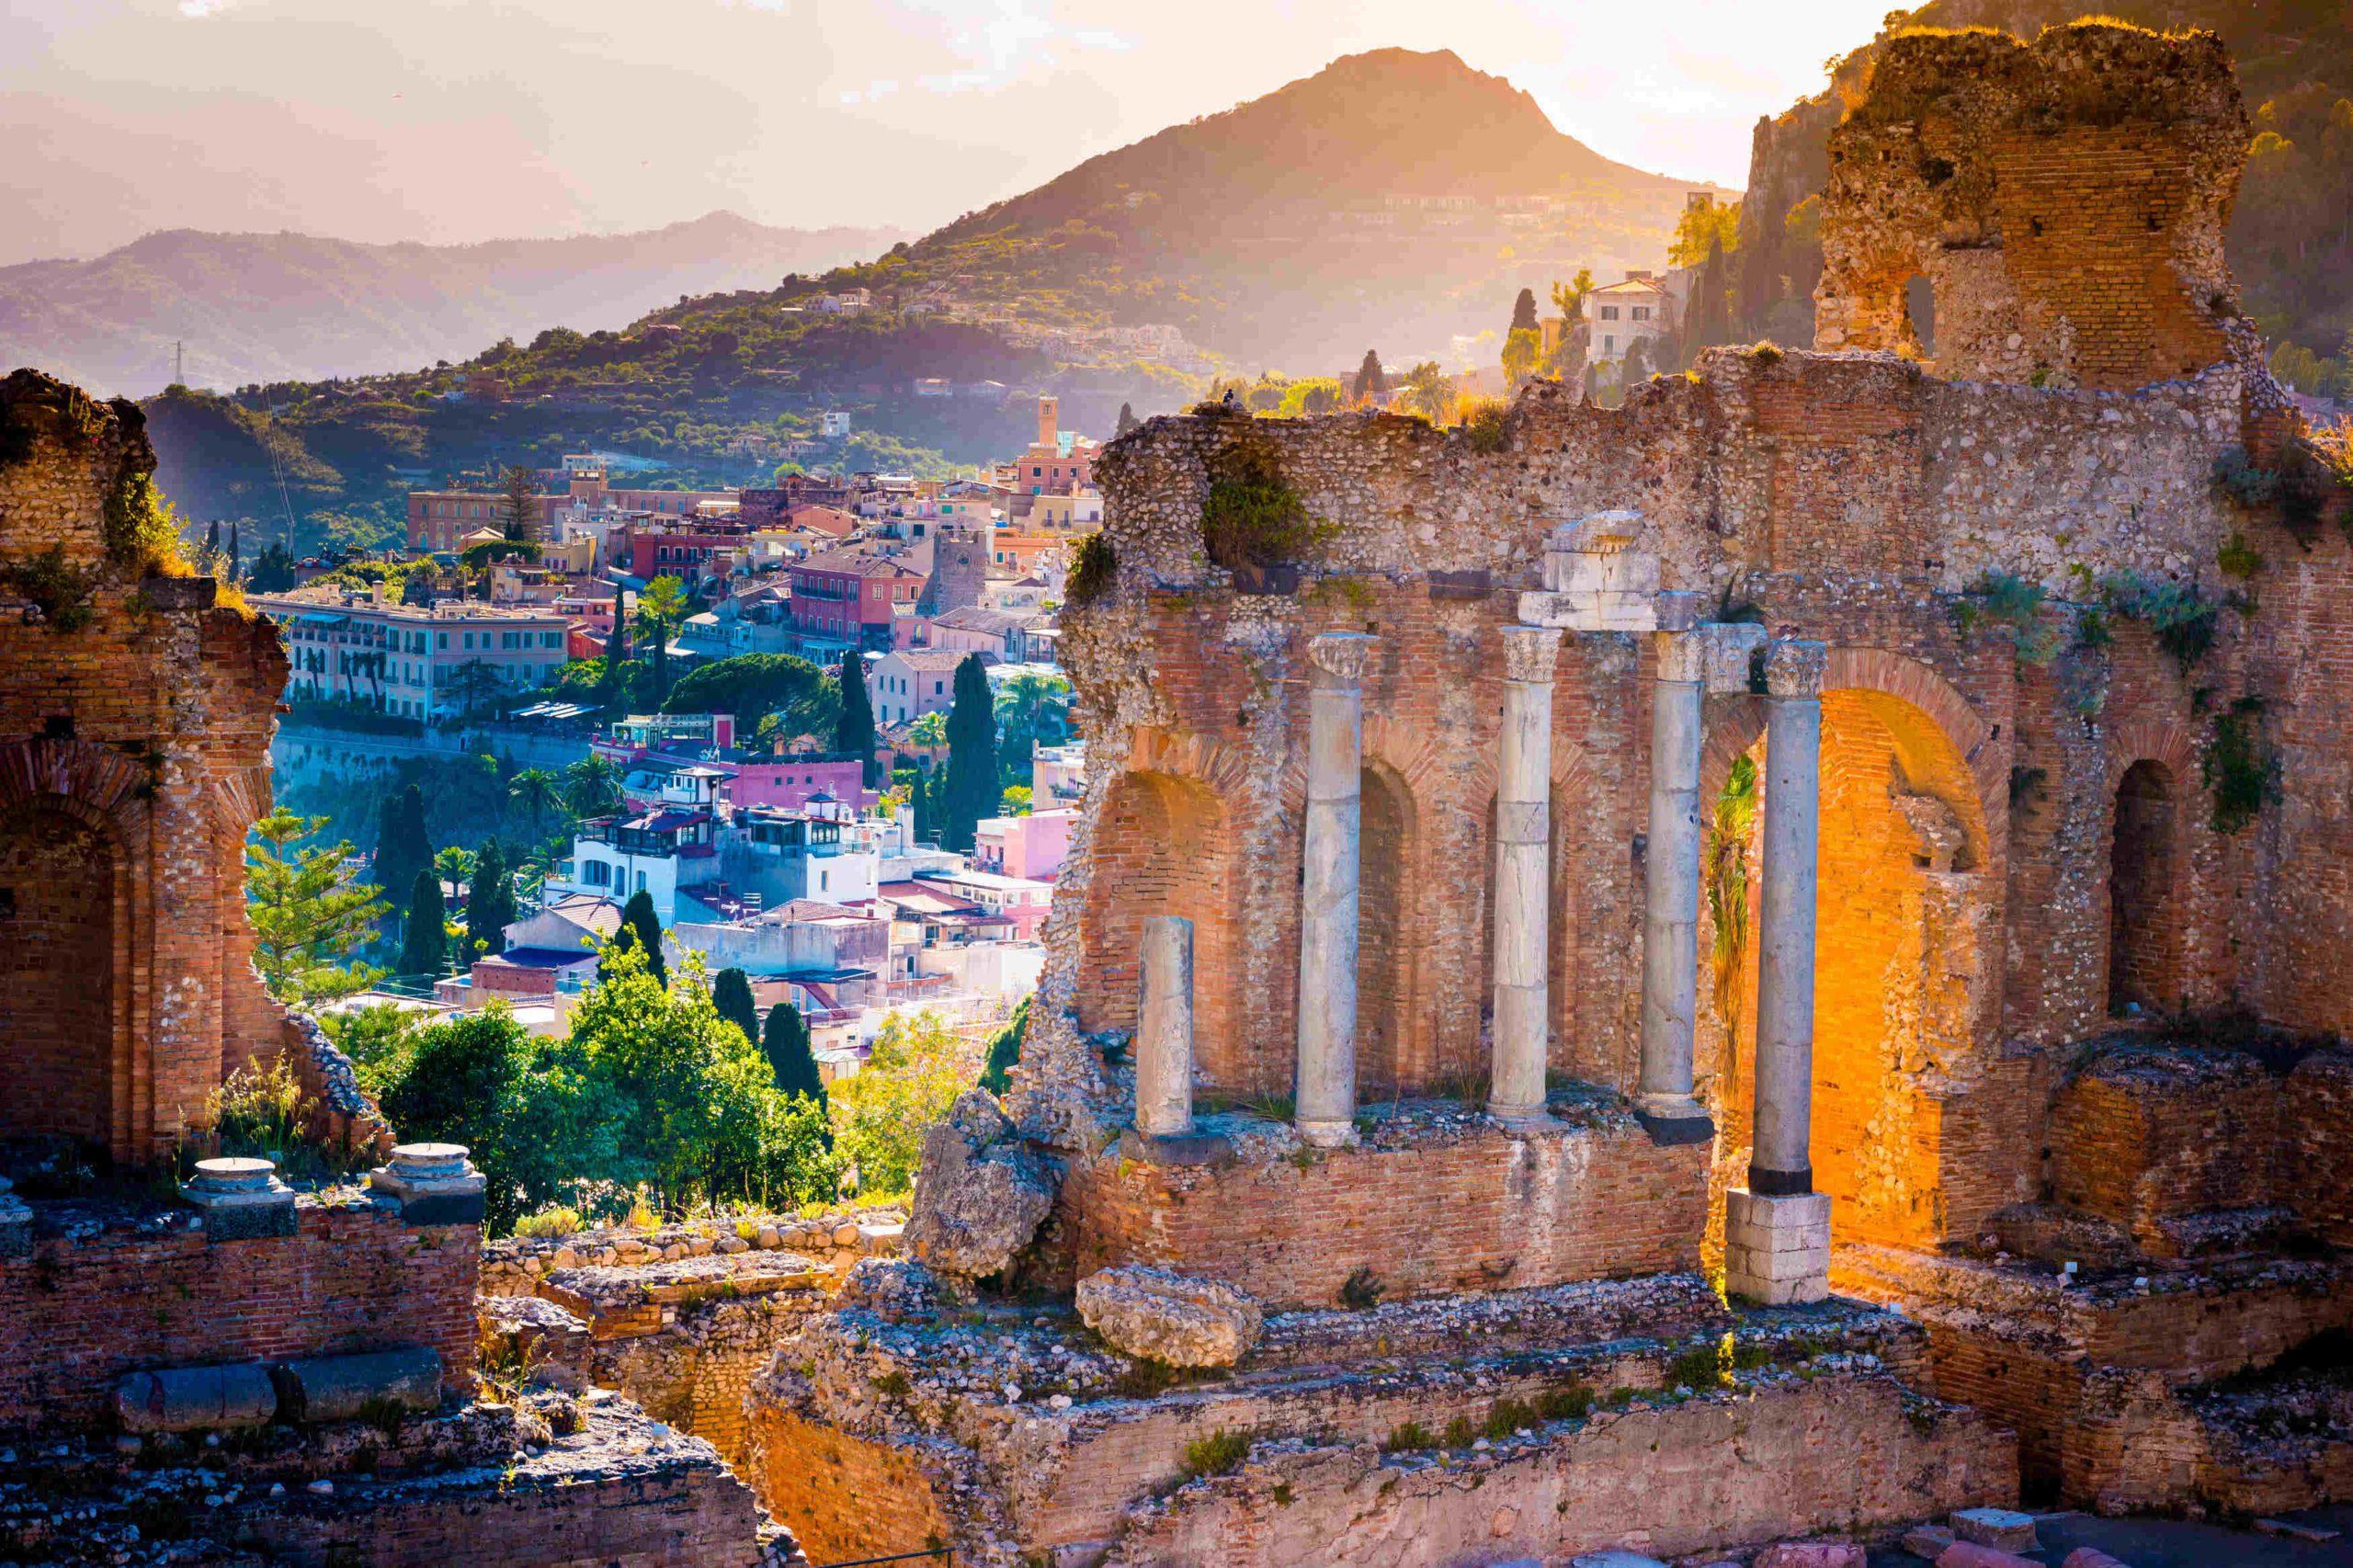 La gestione del San Domenico Palace di Taormina passa a Four Seasons Hotels